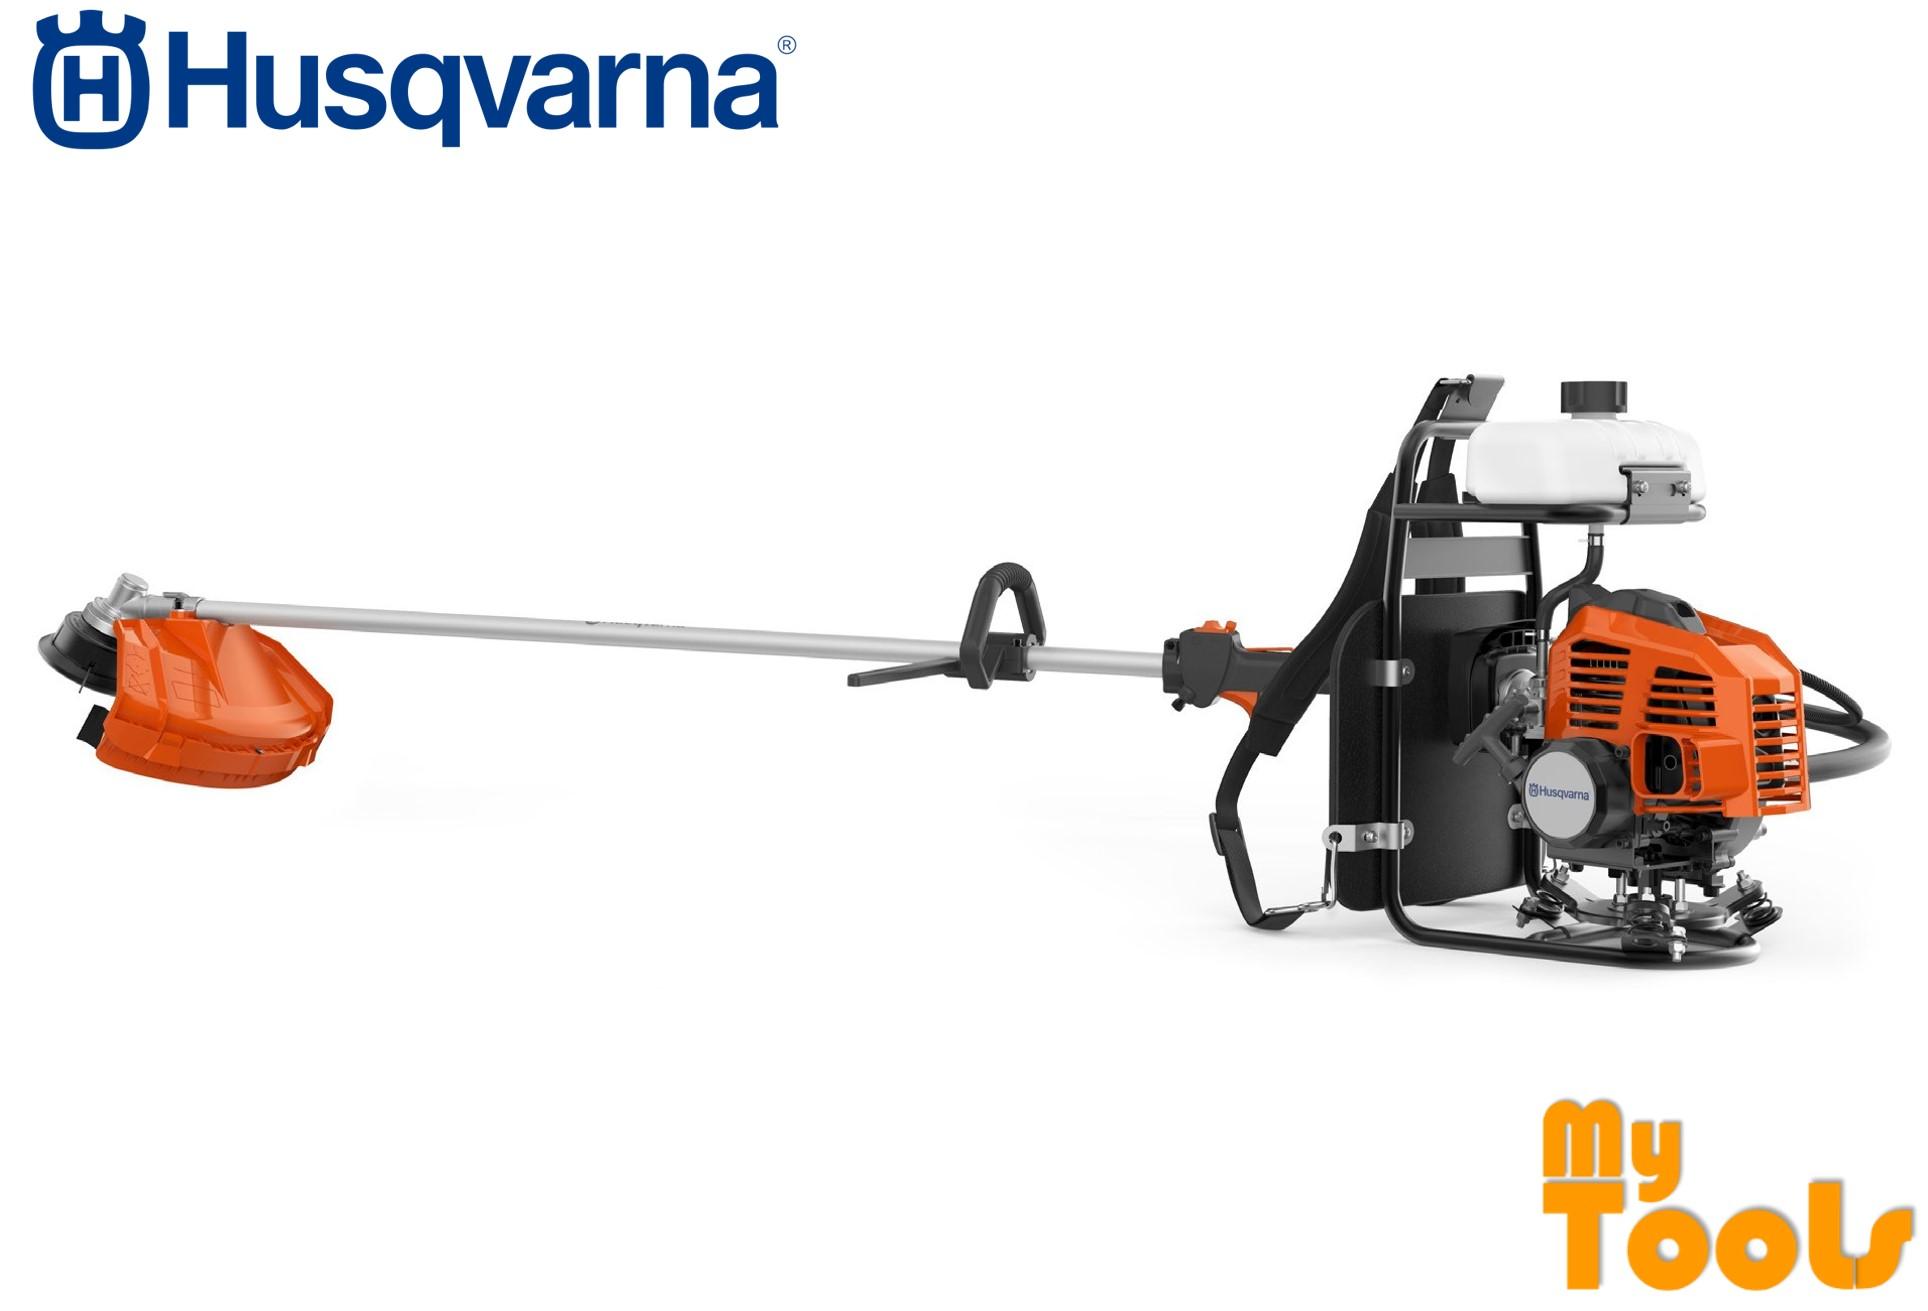 Husqvarna 131RB Knapsack Grass Cutter Brush cutter 33cc, 0.9kW, 10.2kg